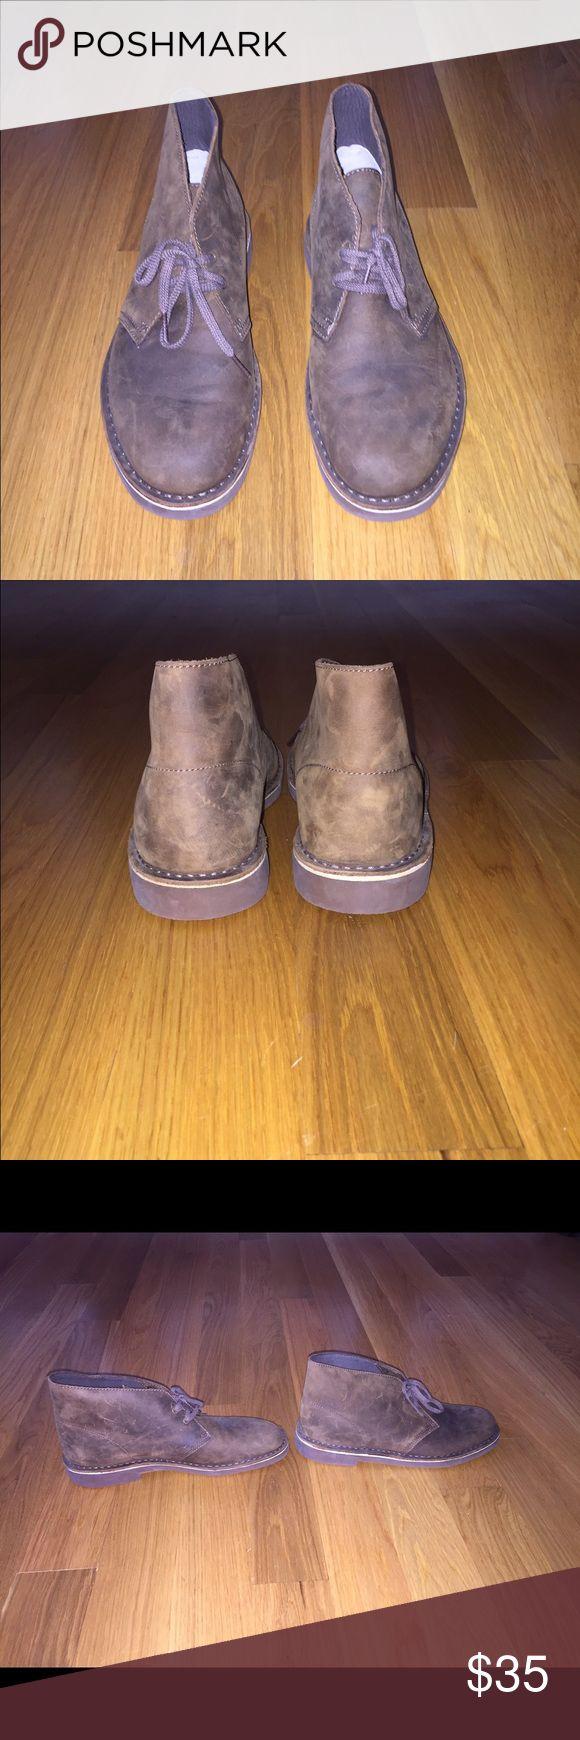 Mens Clarks Chukka Desert Boots New 9M New without box, men's Clarks brown leather Chukka desert boots, 9M. Clarks Shoes Chukka Boots